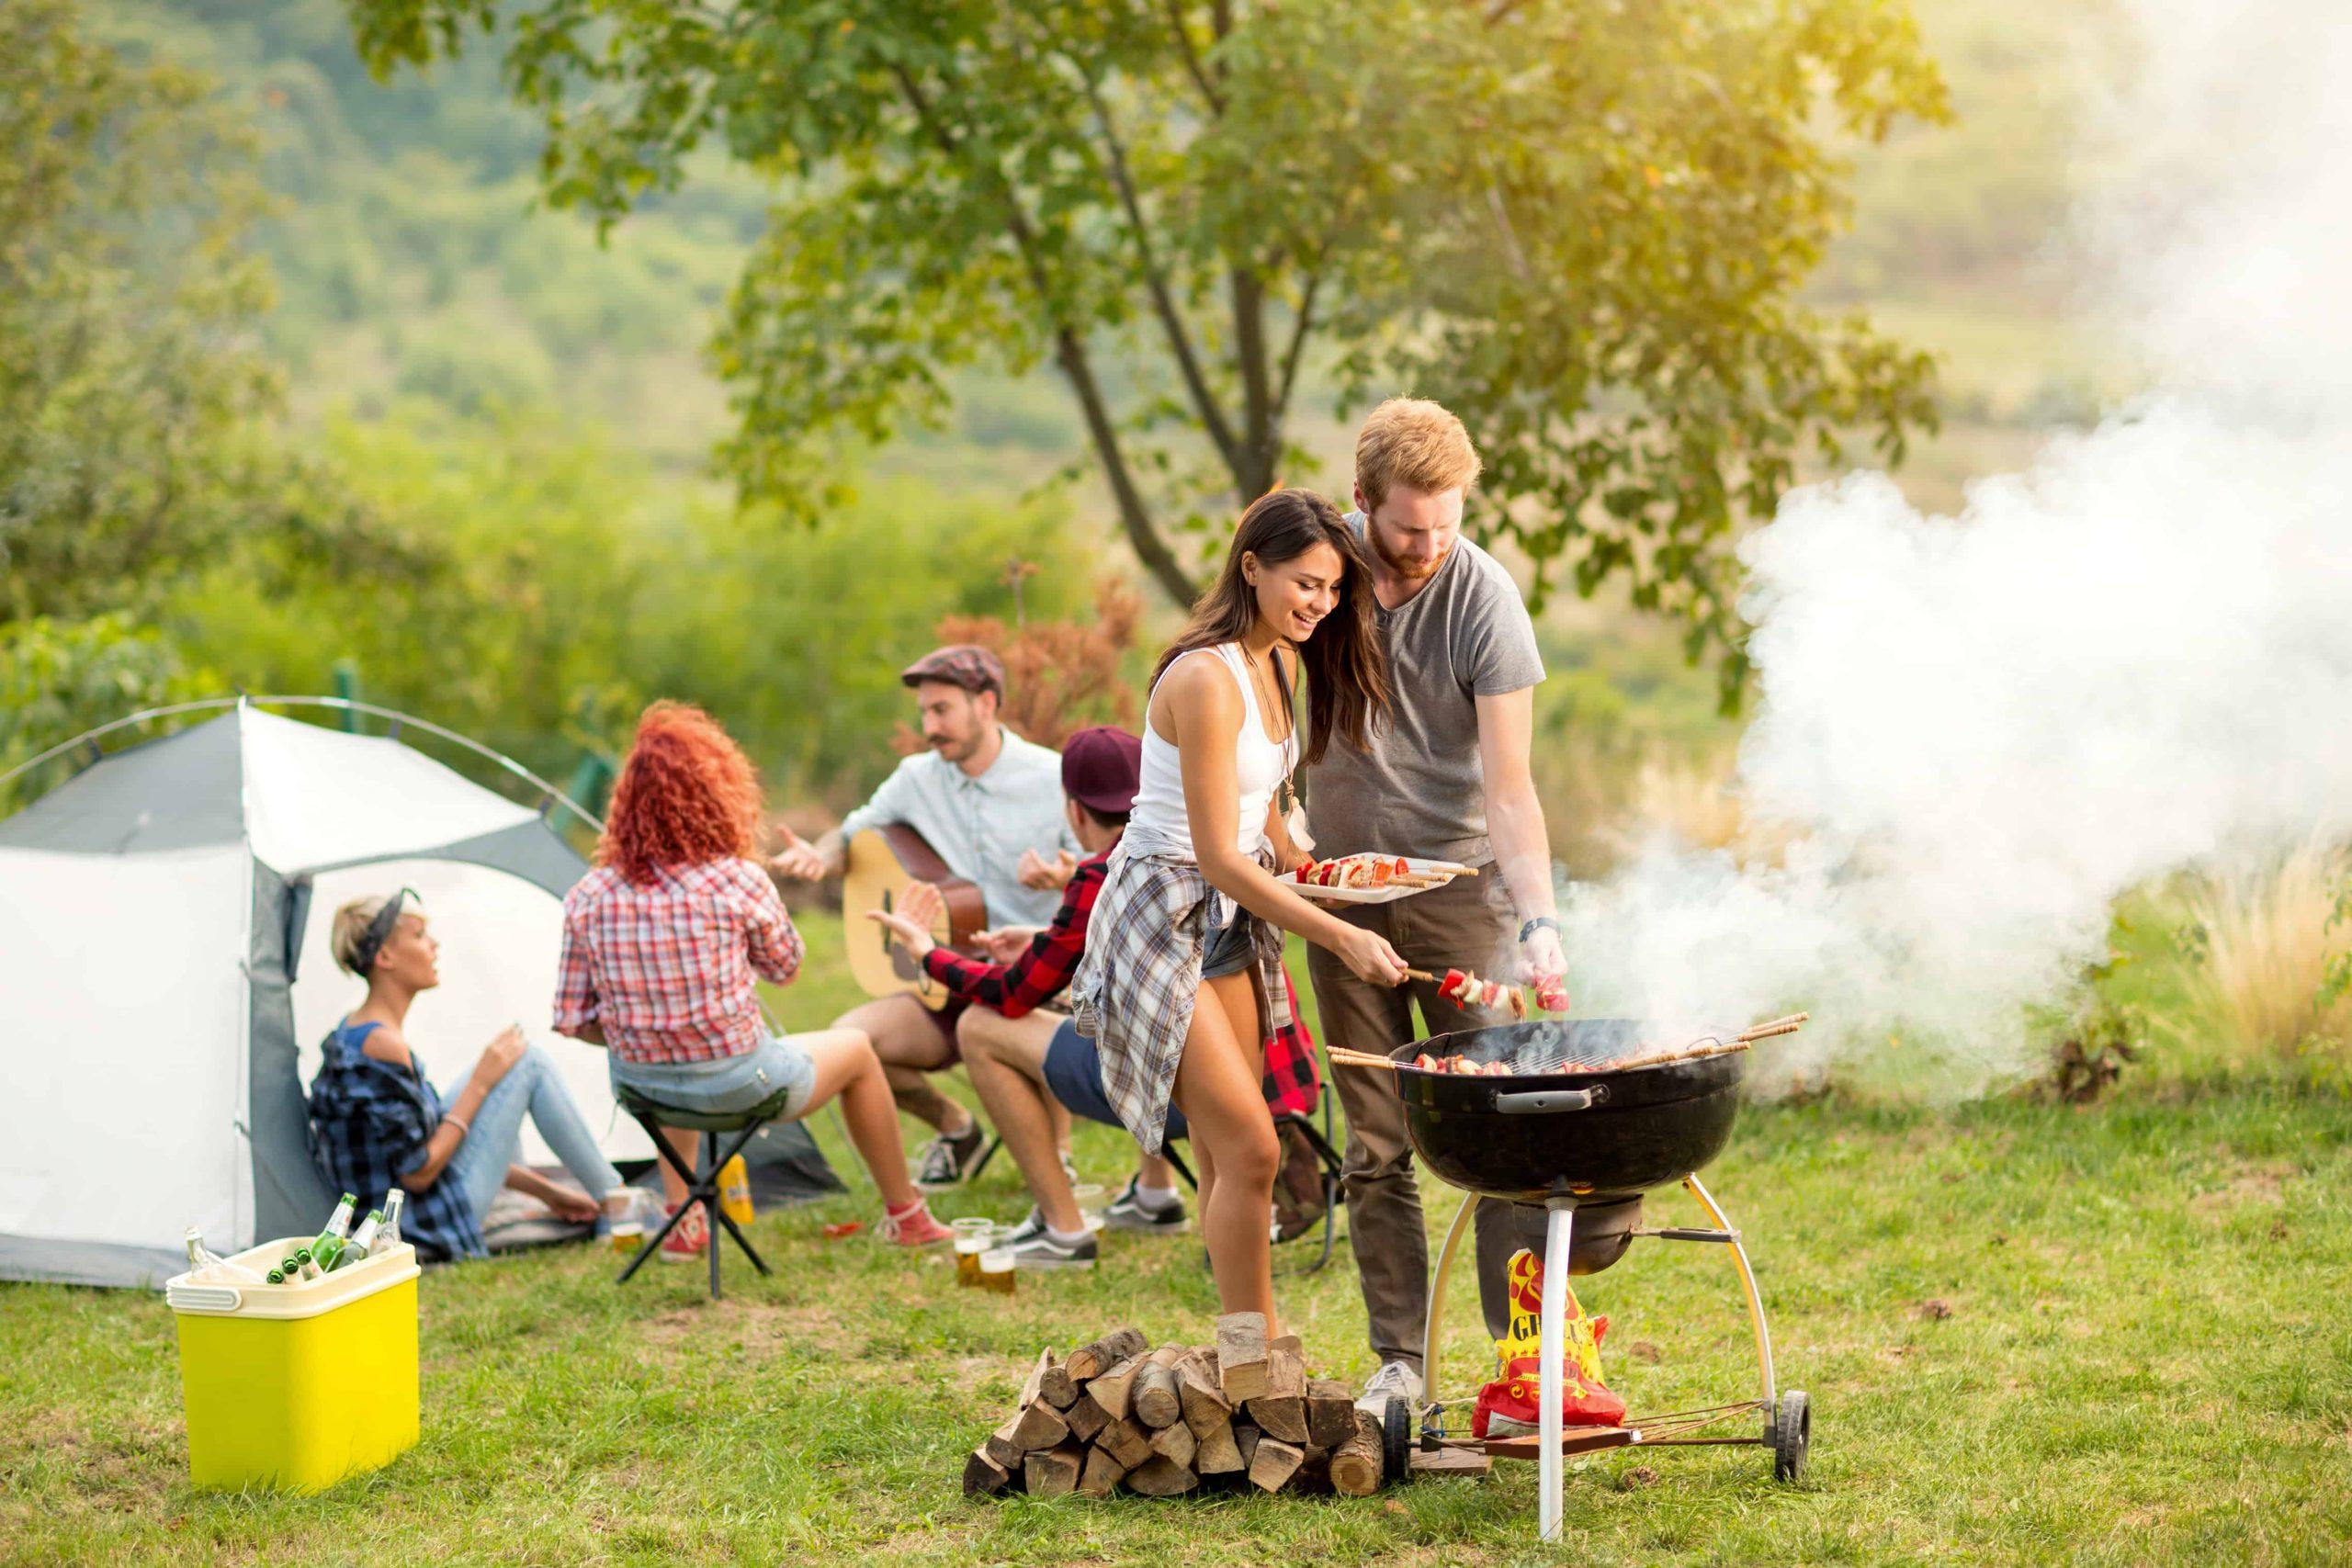 Camping Grill: Test & Empfehlungen (06/20)